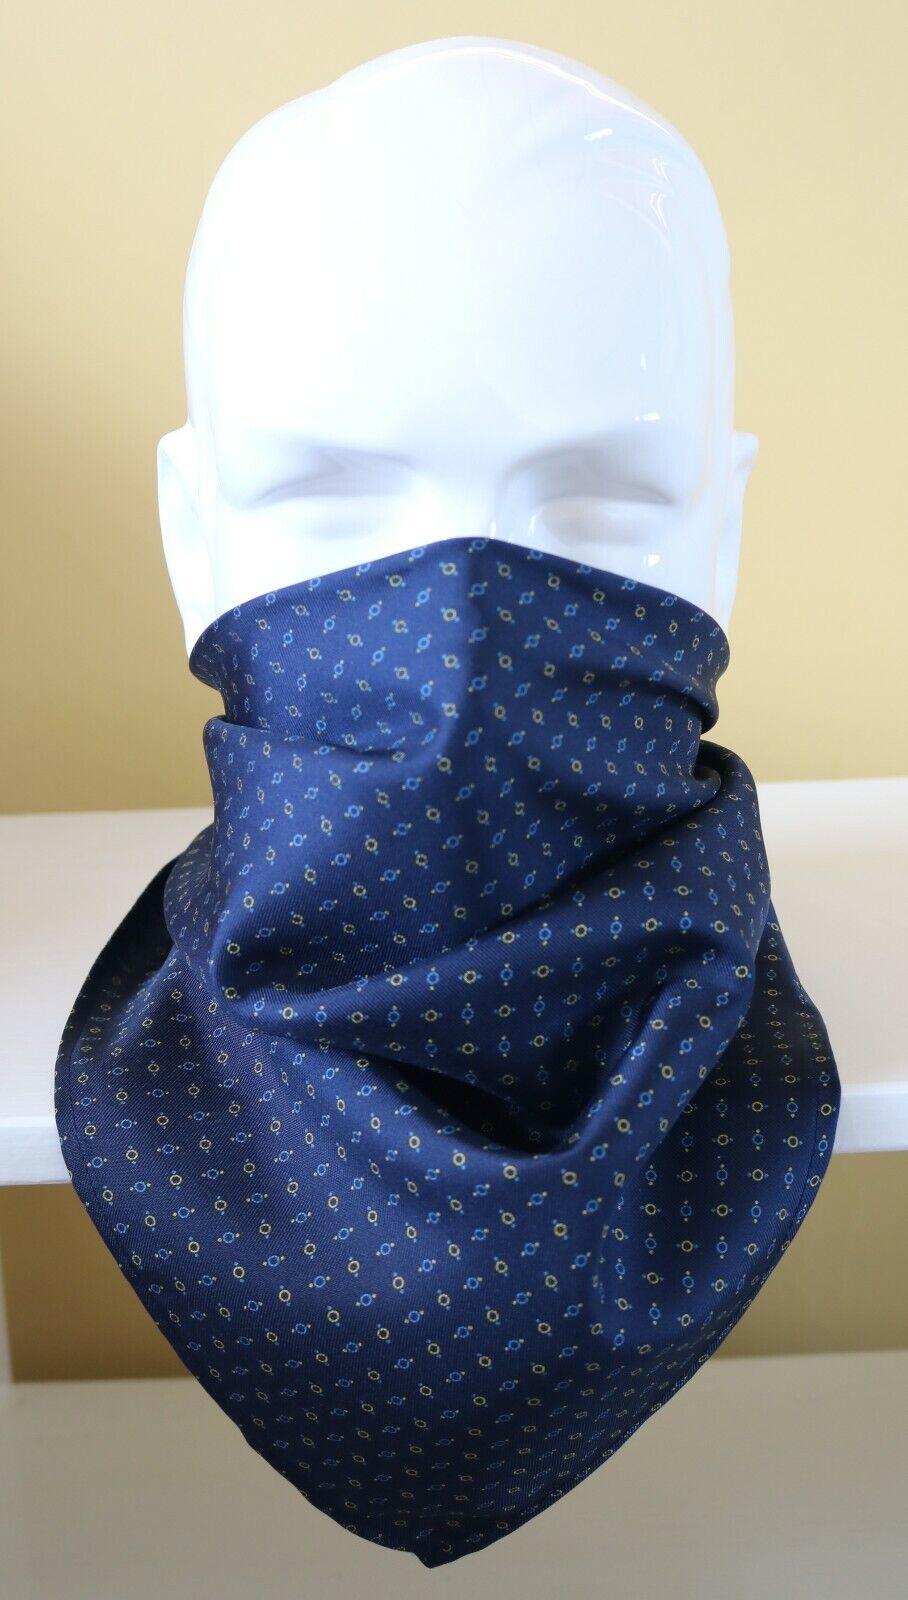 100% Silk Neckerchief, cravat or face covering. 25